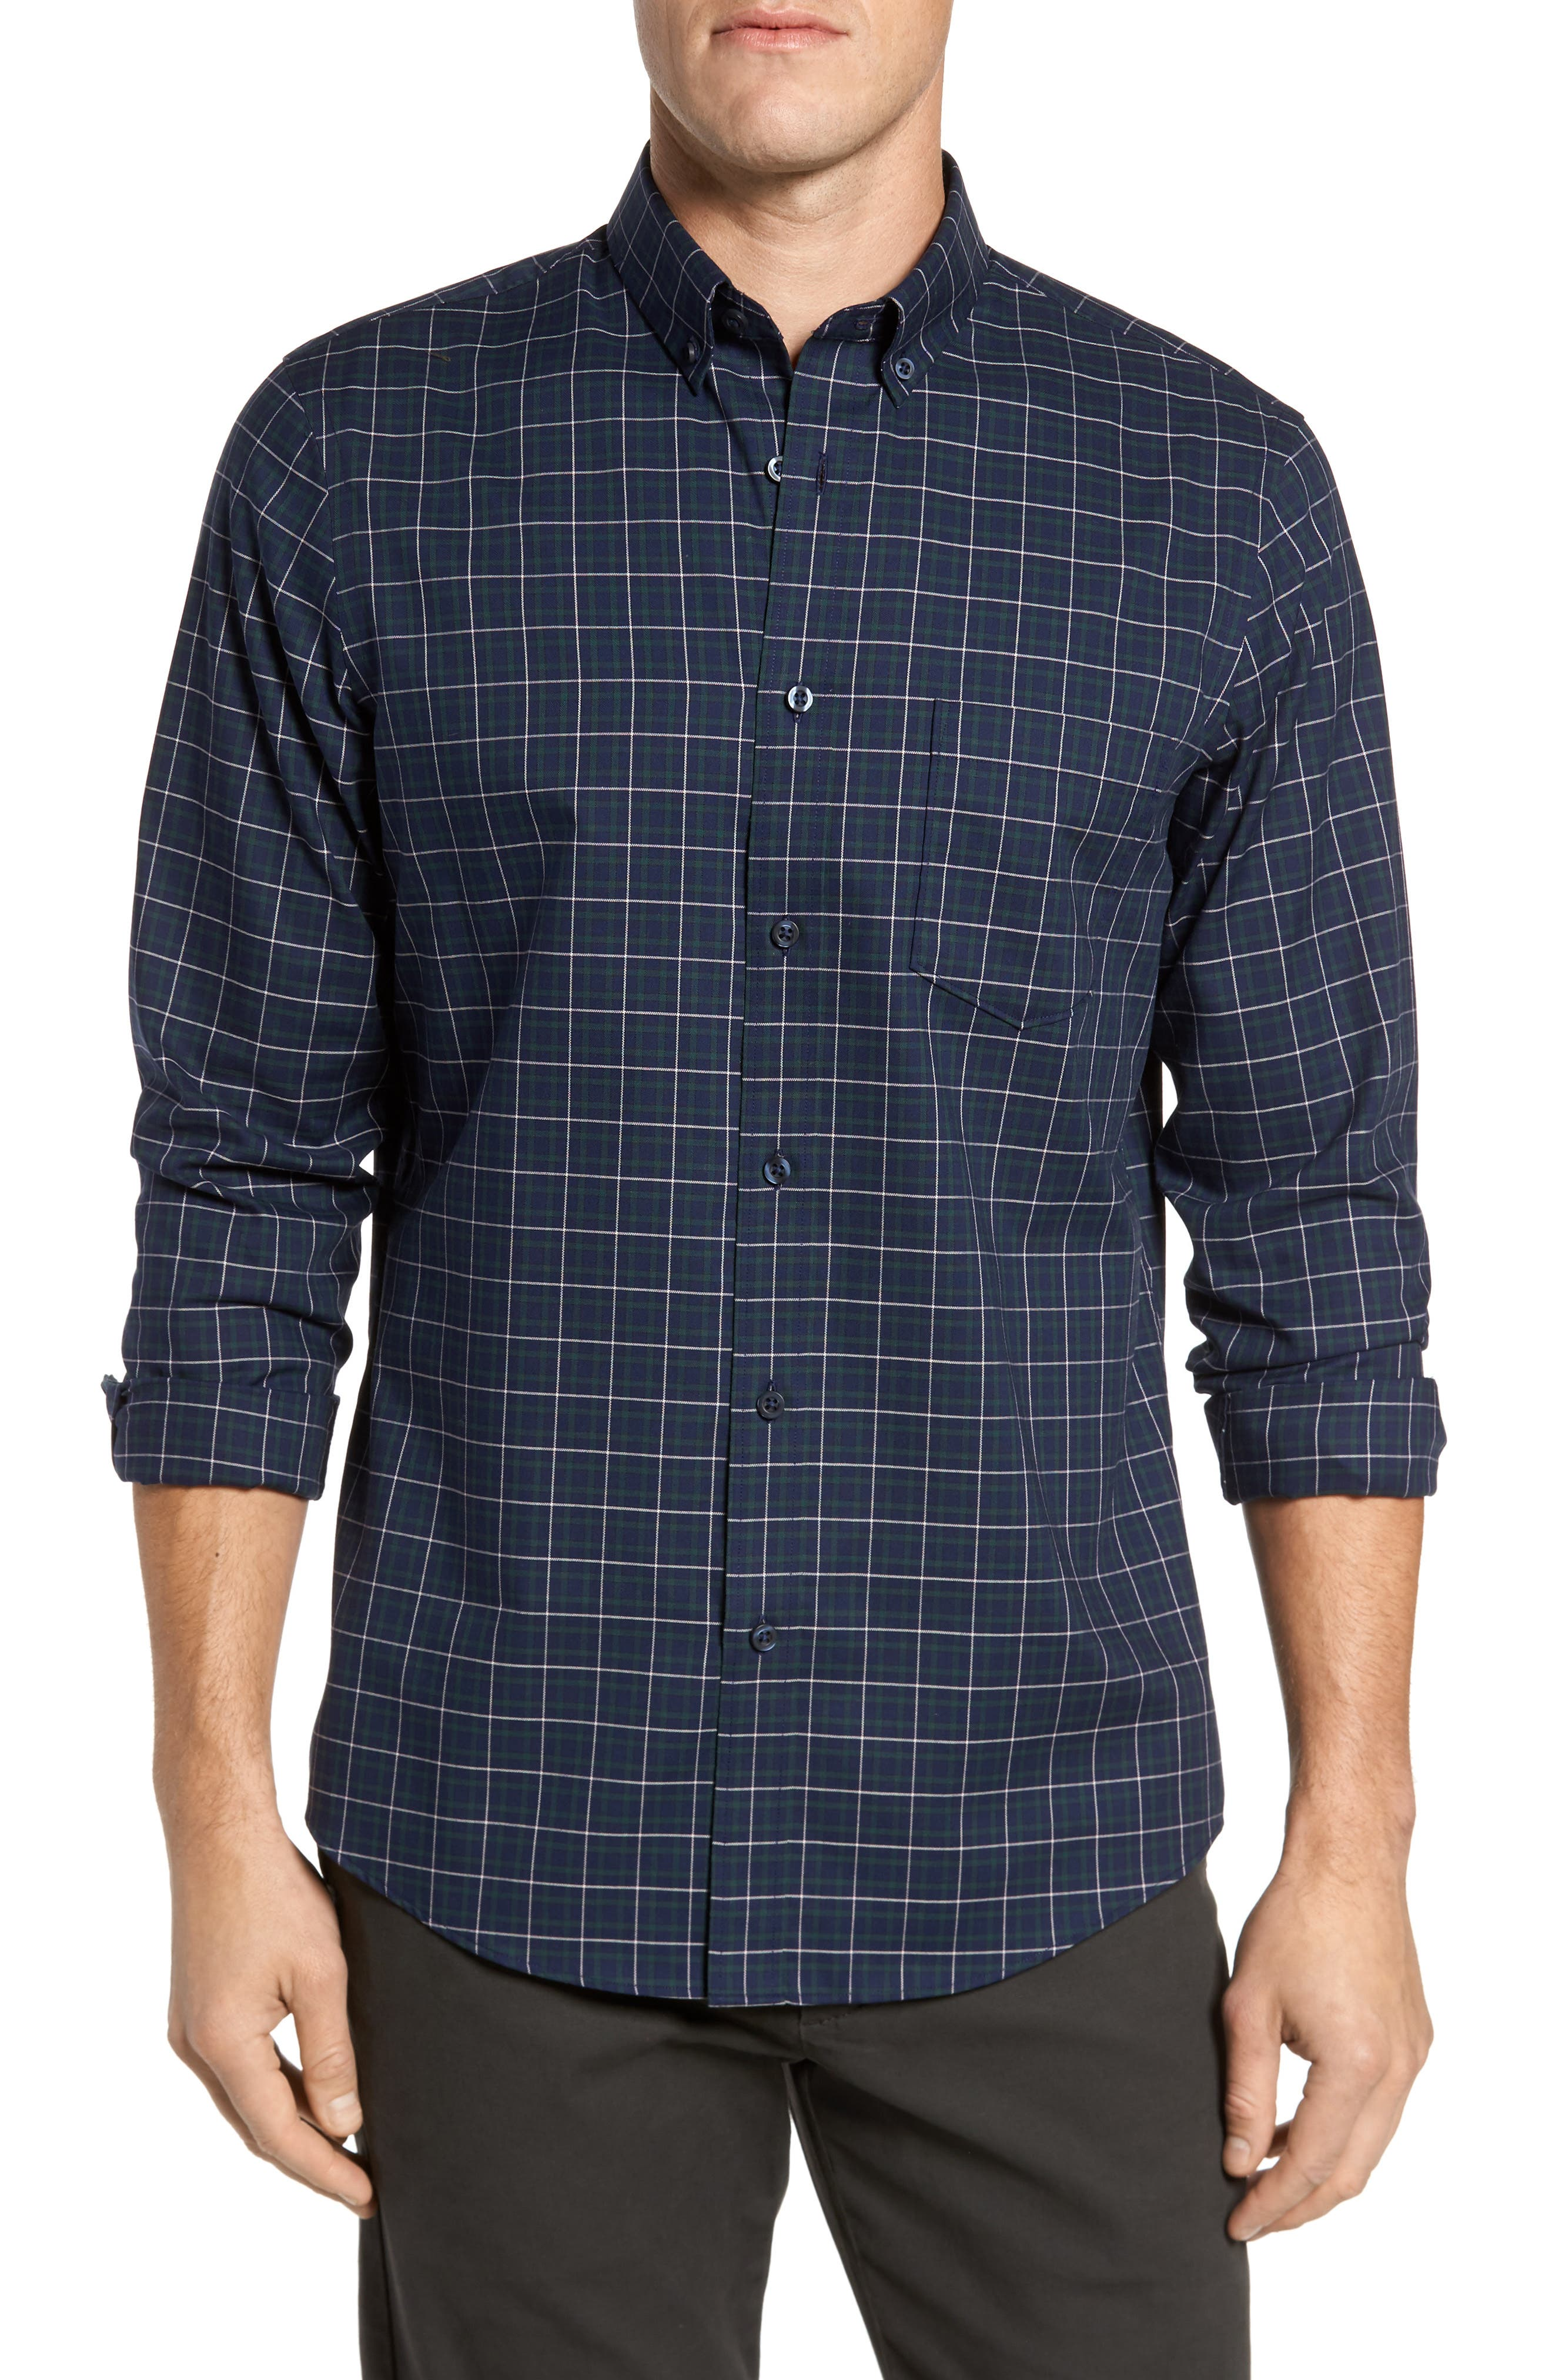 Alternate Image 1 Selected - Nordstrom Men's Shop Regular Fit Non-Iron Plaid Sport Shirt